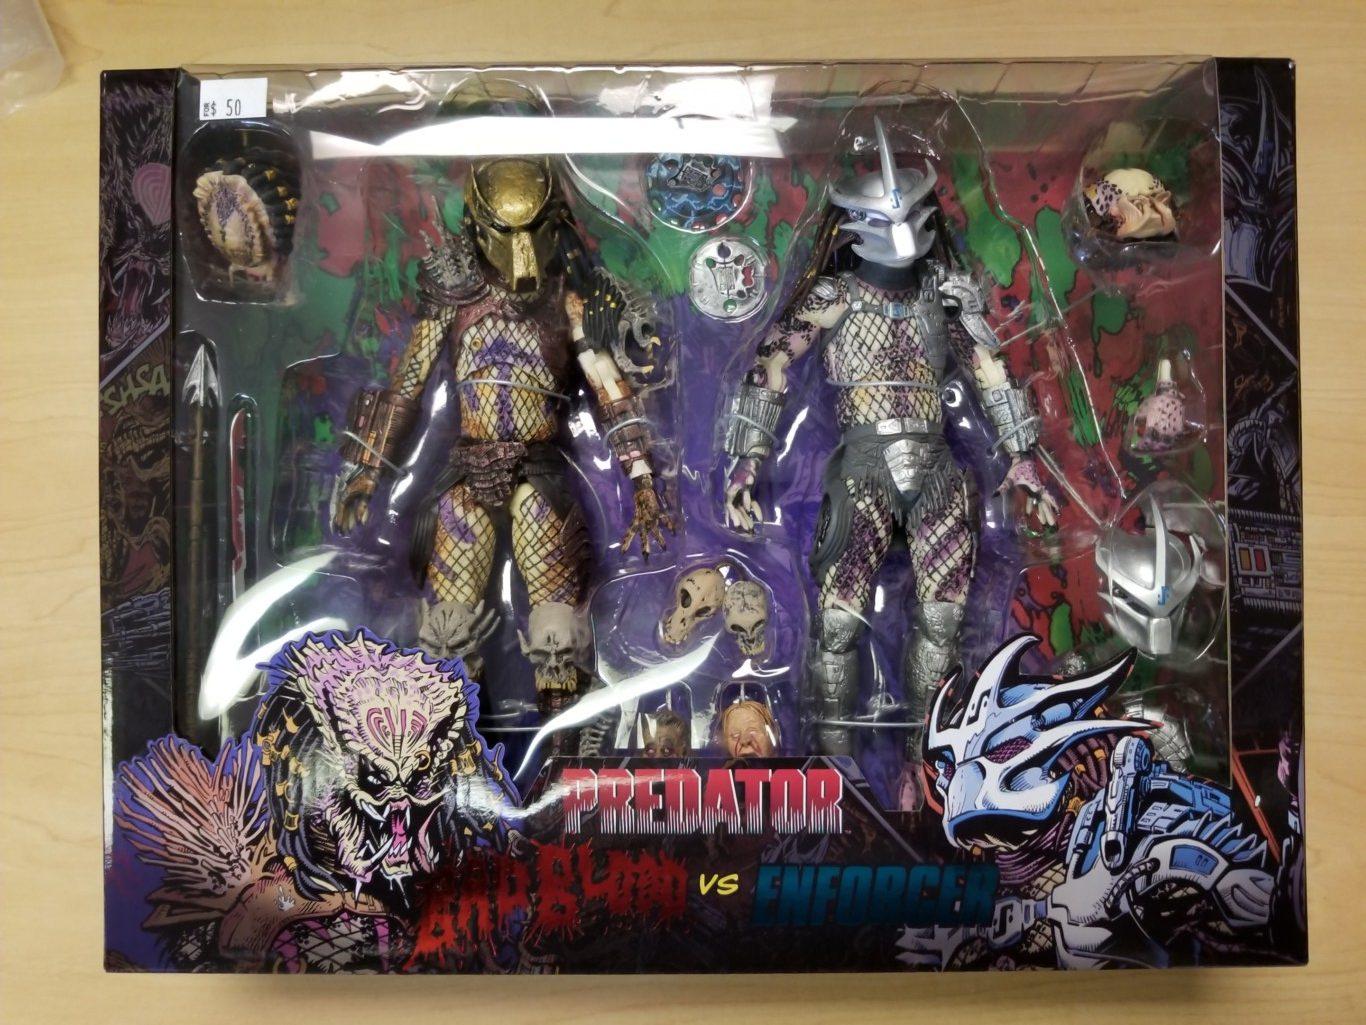 NECA Predator Bad Blood vs Enforcer 2-pack